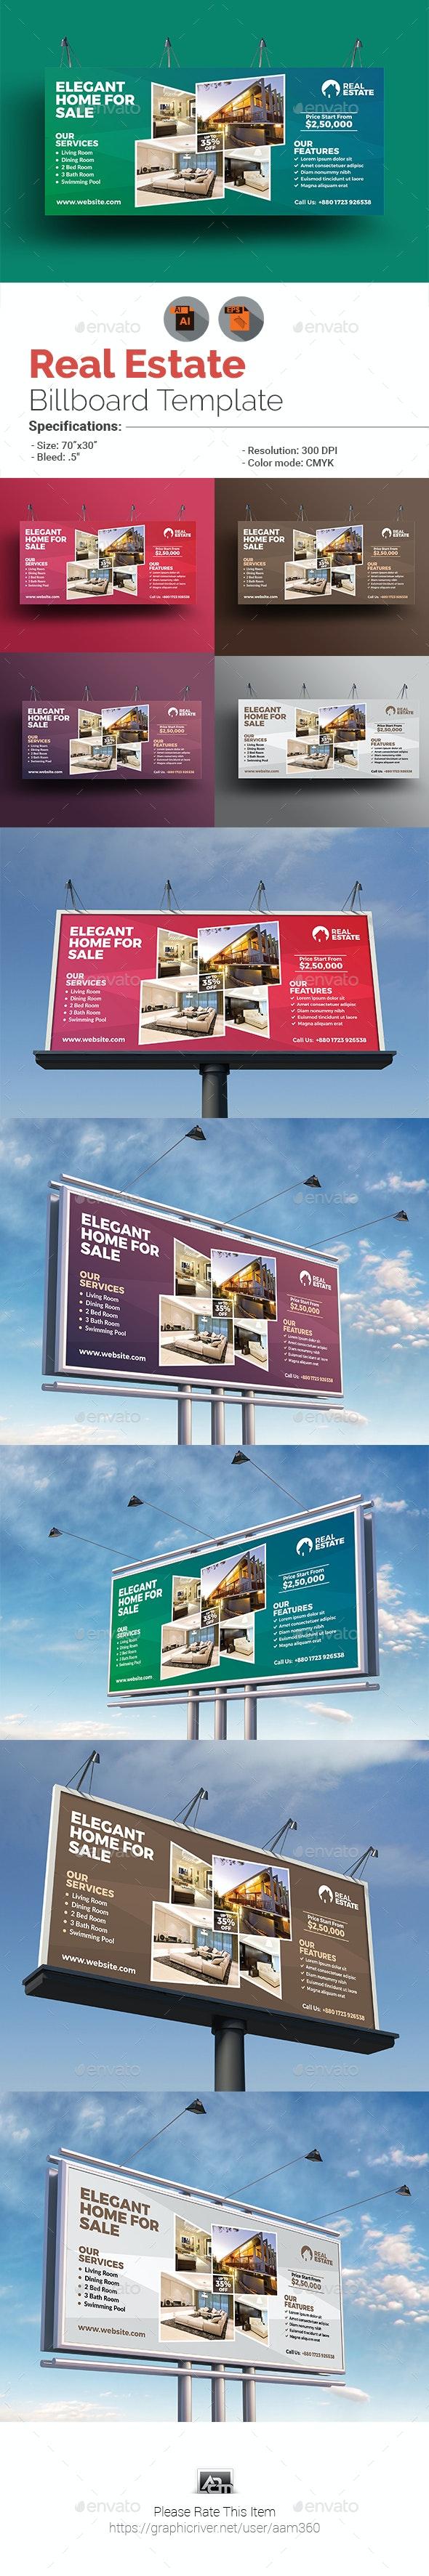 Real Estate Billboard Template - Signage Print Templates